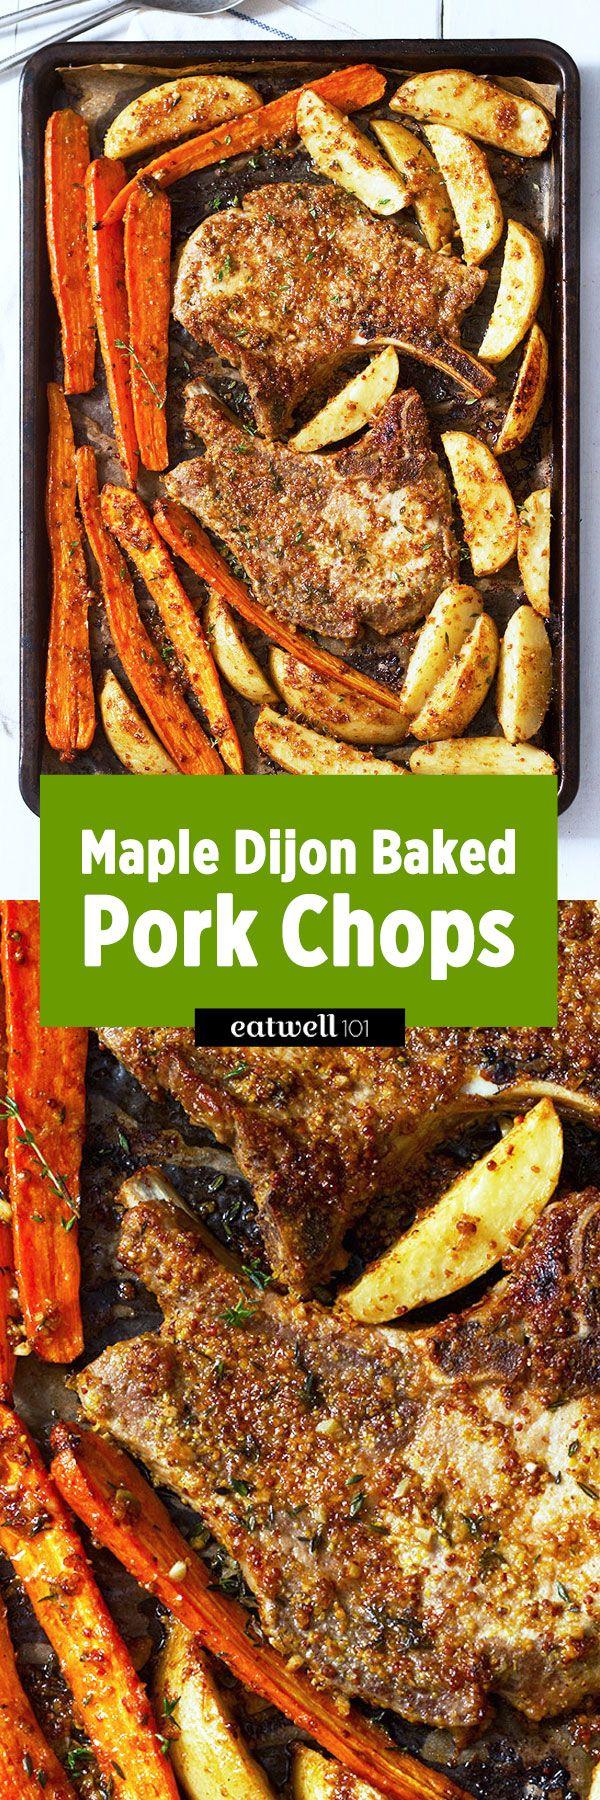 25+ Best Ideas About Baked Pork Chops On Pinterest  Easy Pork Chop  Recipes, Easy Baked Pork Chops And Oven Baked Pork Chops